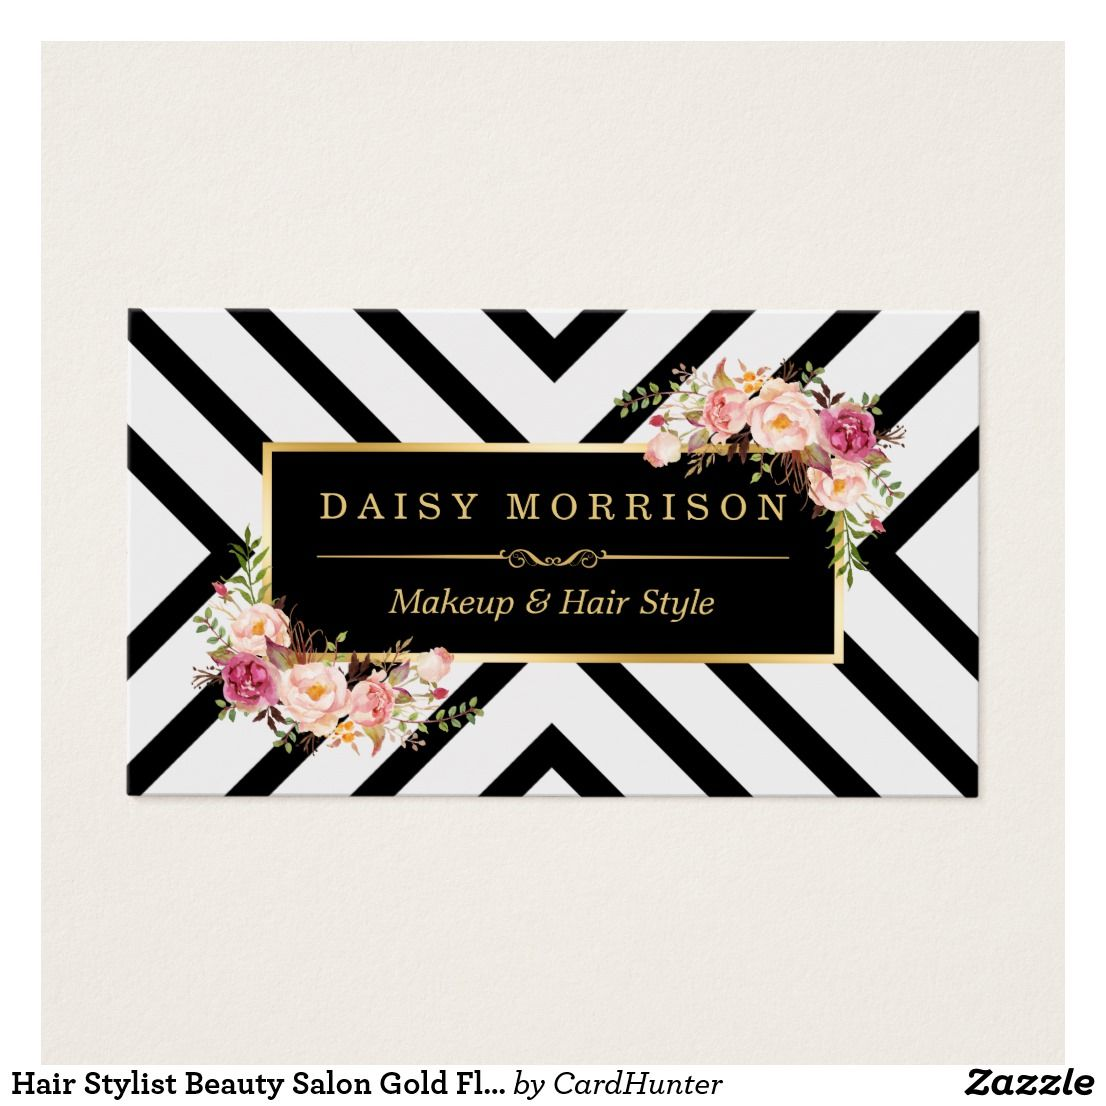 Hair Stylist Beauty Salon Gold Floral Appointment Zazzle Com In 2021 Salon Business Cards Salon Gold Floral Business Cards